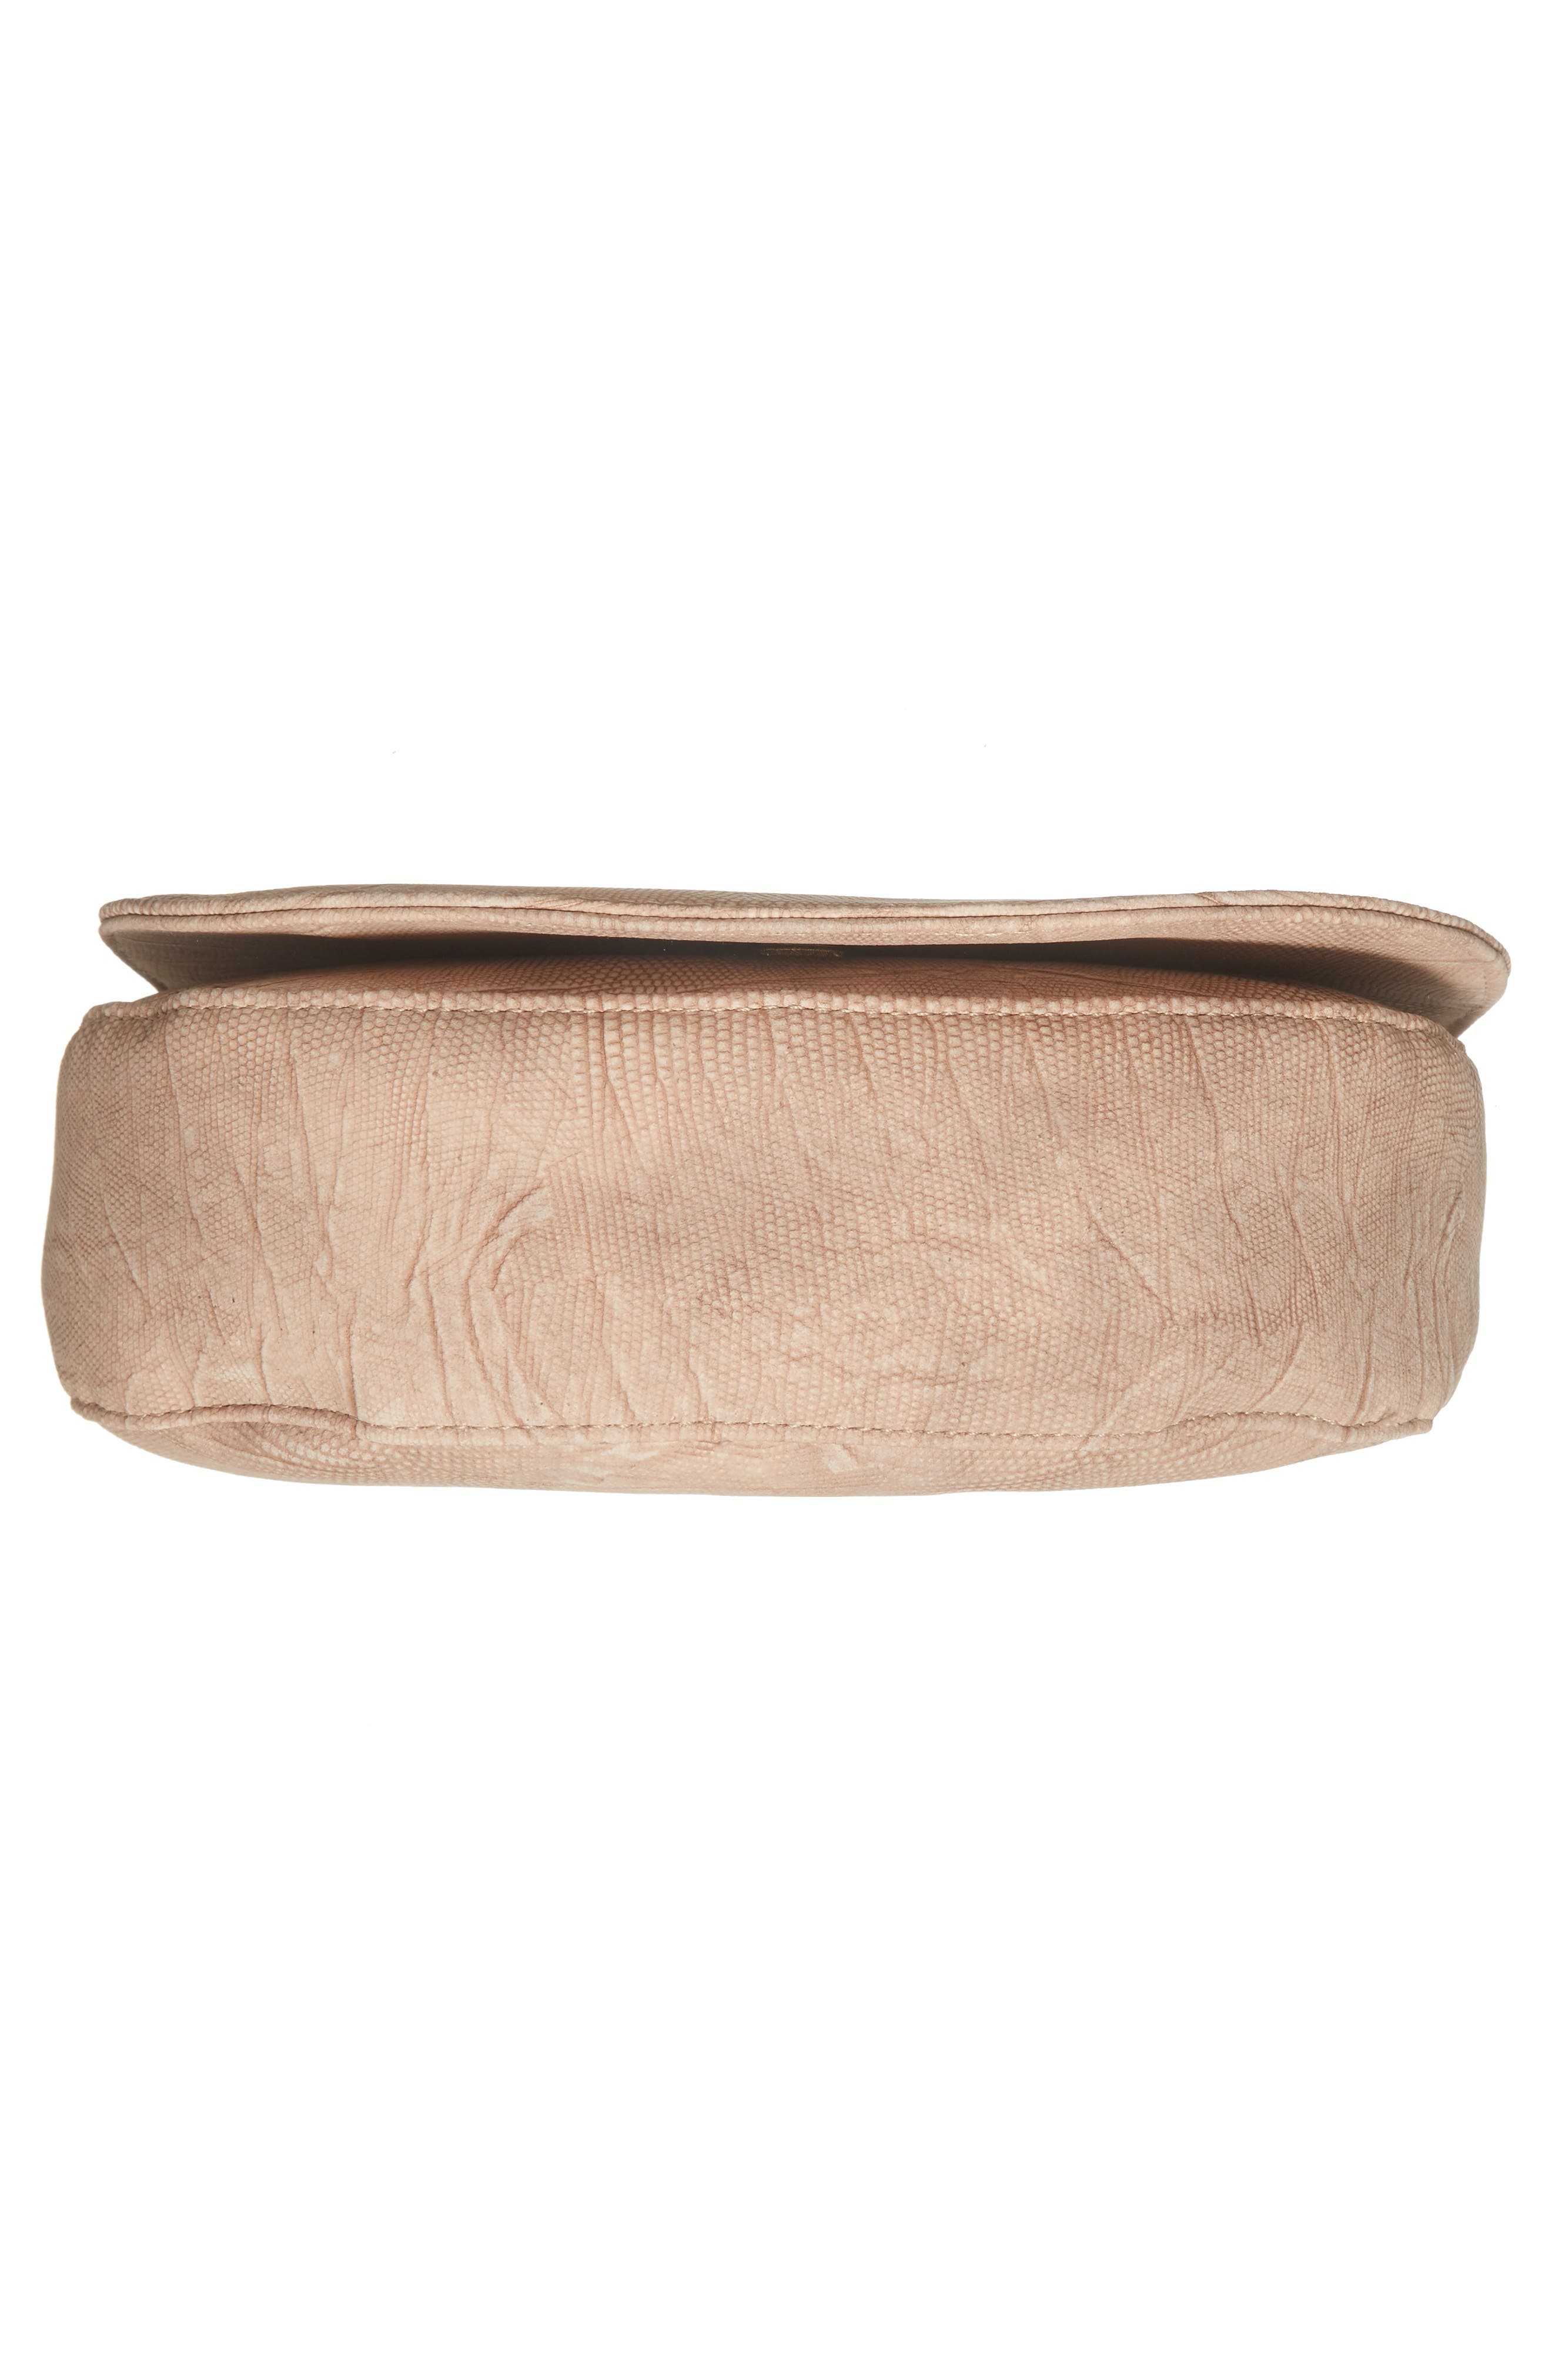 Livvy Faux Leather Crossbody Saddle Bag,                             Alternate thumbnail 17, color,